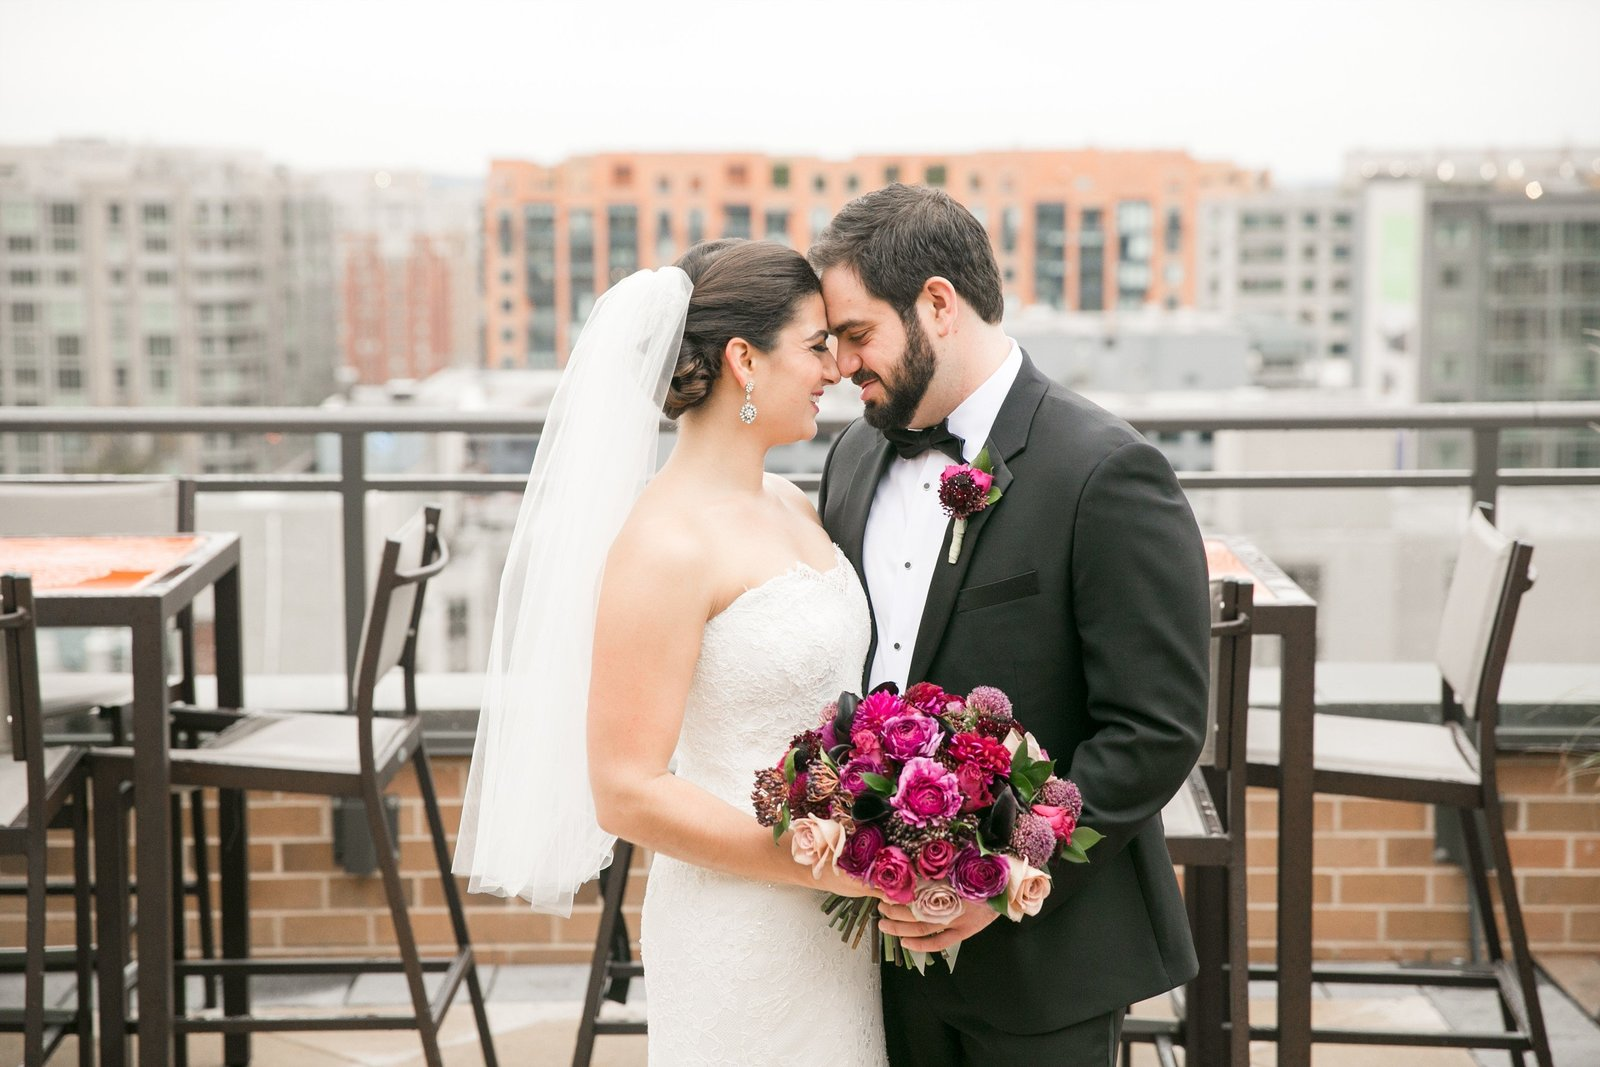 Black-tie-wedding-photos-longview-gallery-dc (138)